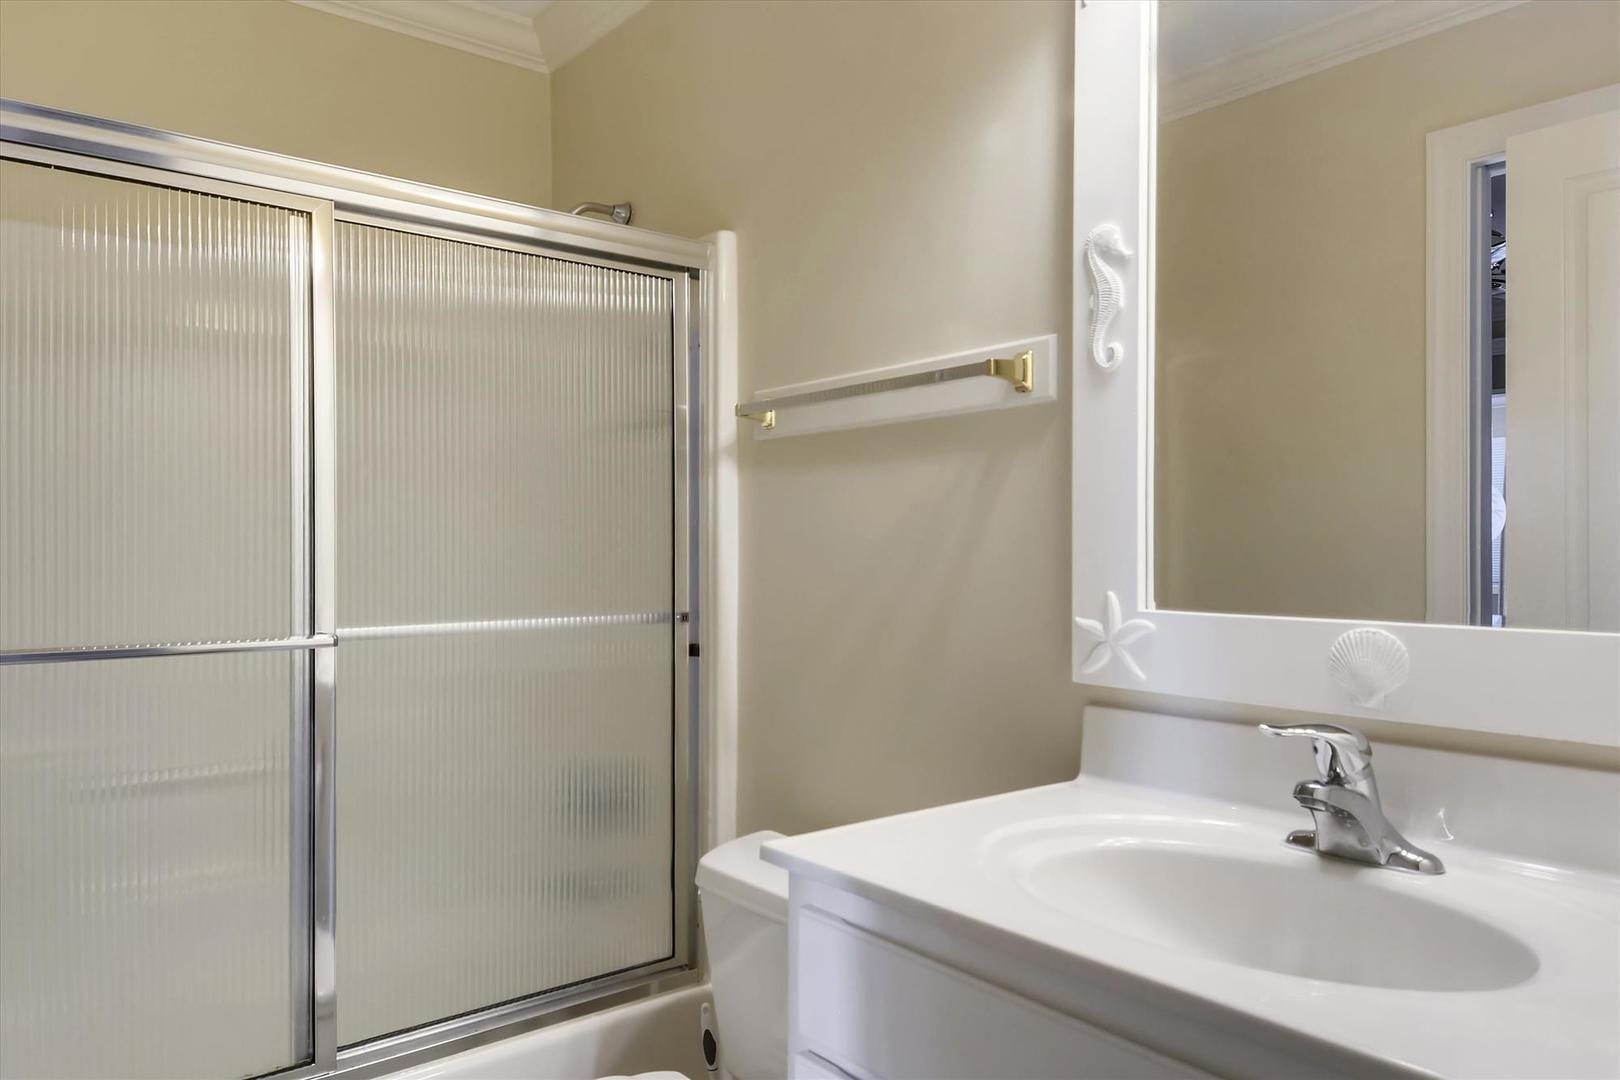 Bayville Shores 1169 - Lower Level Bathroom